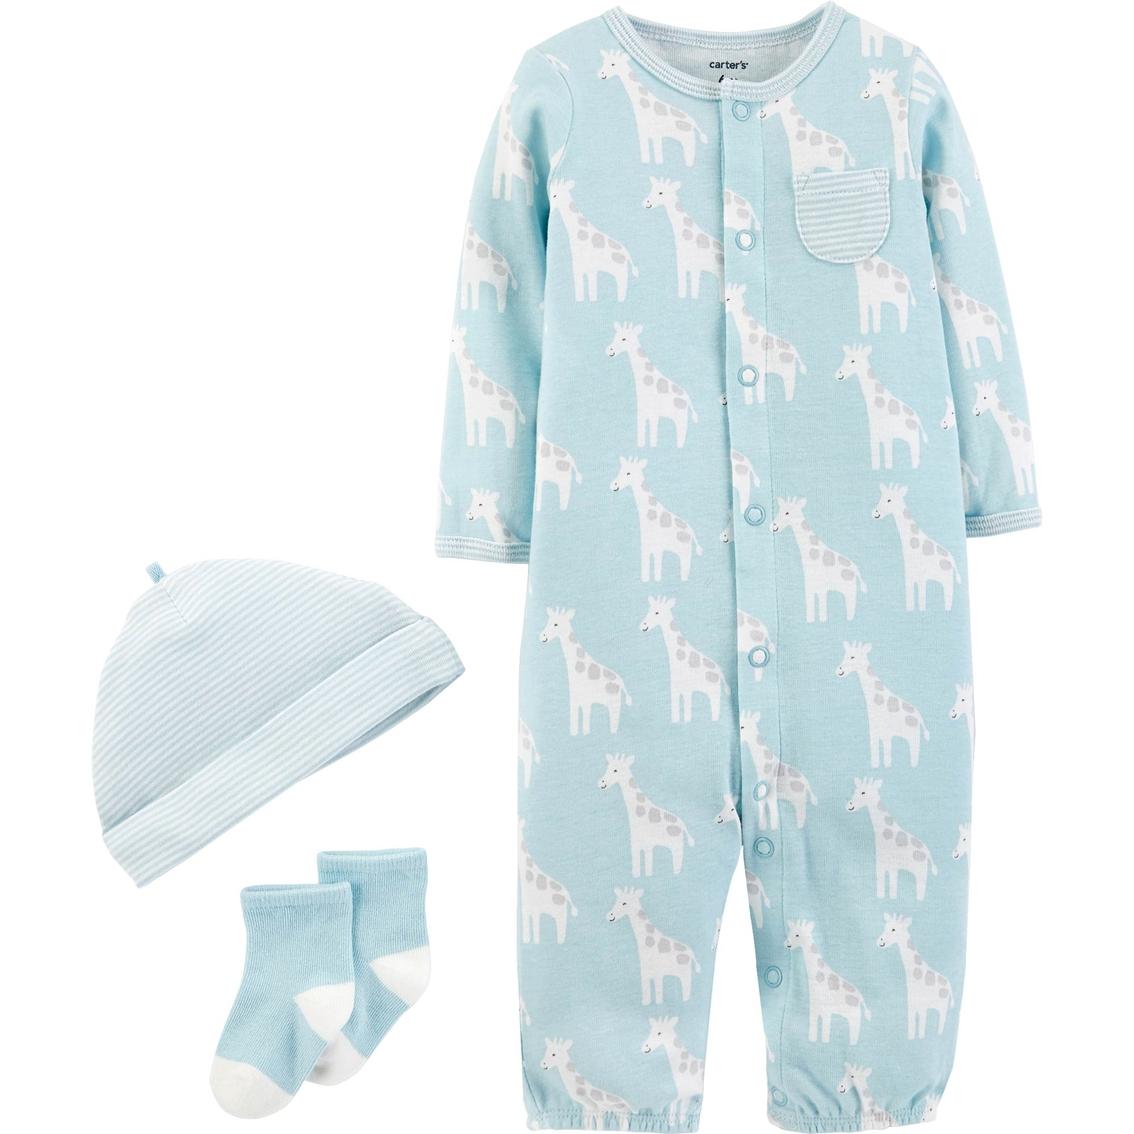 951219ccb2b1 Carter s Infant Boys 3 Pc. Take Me Home Set